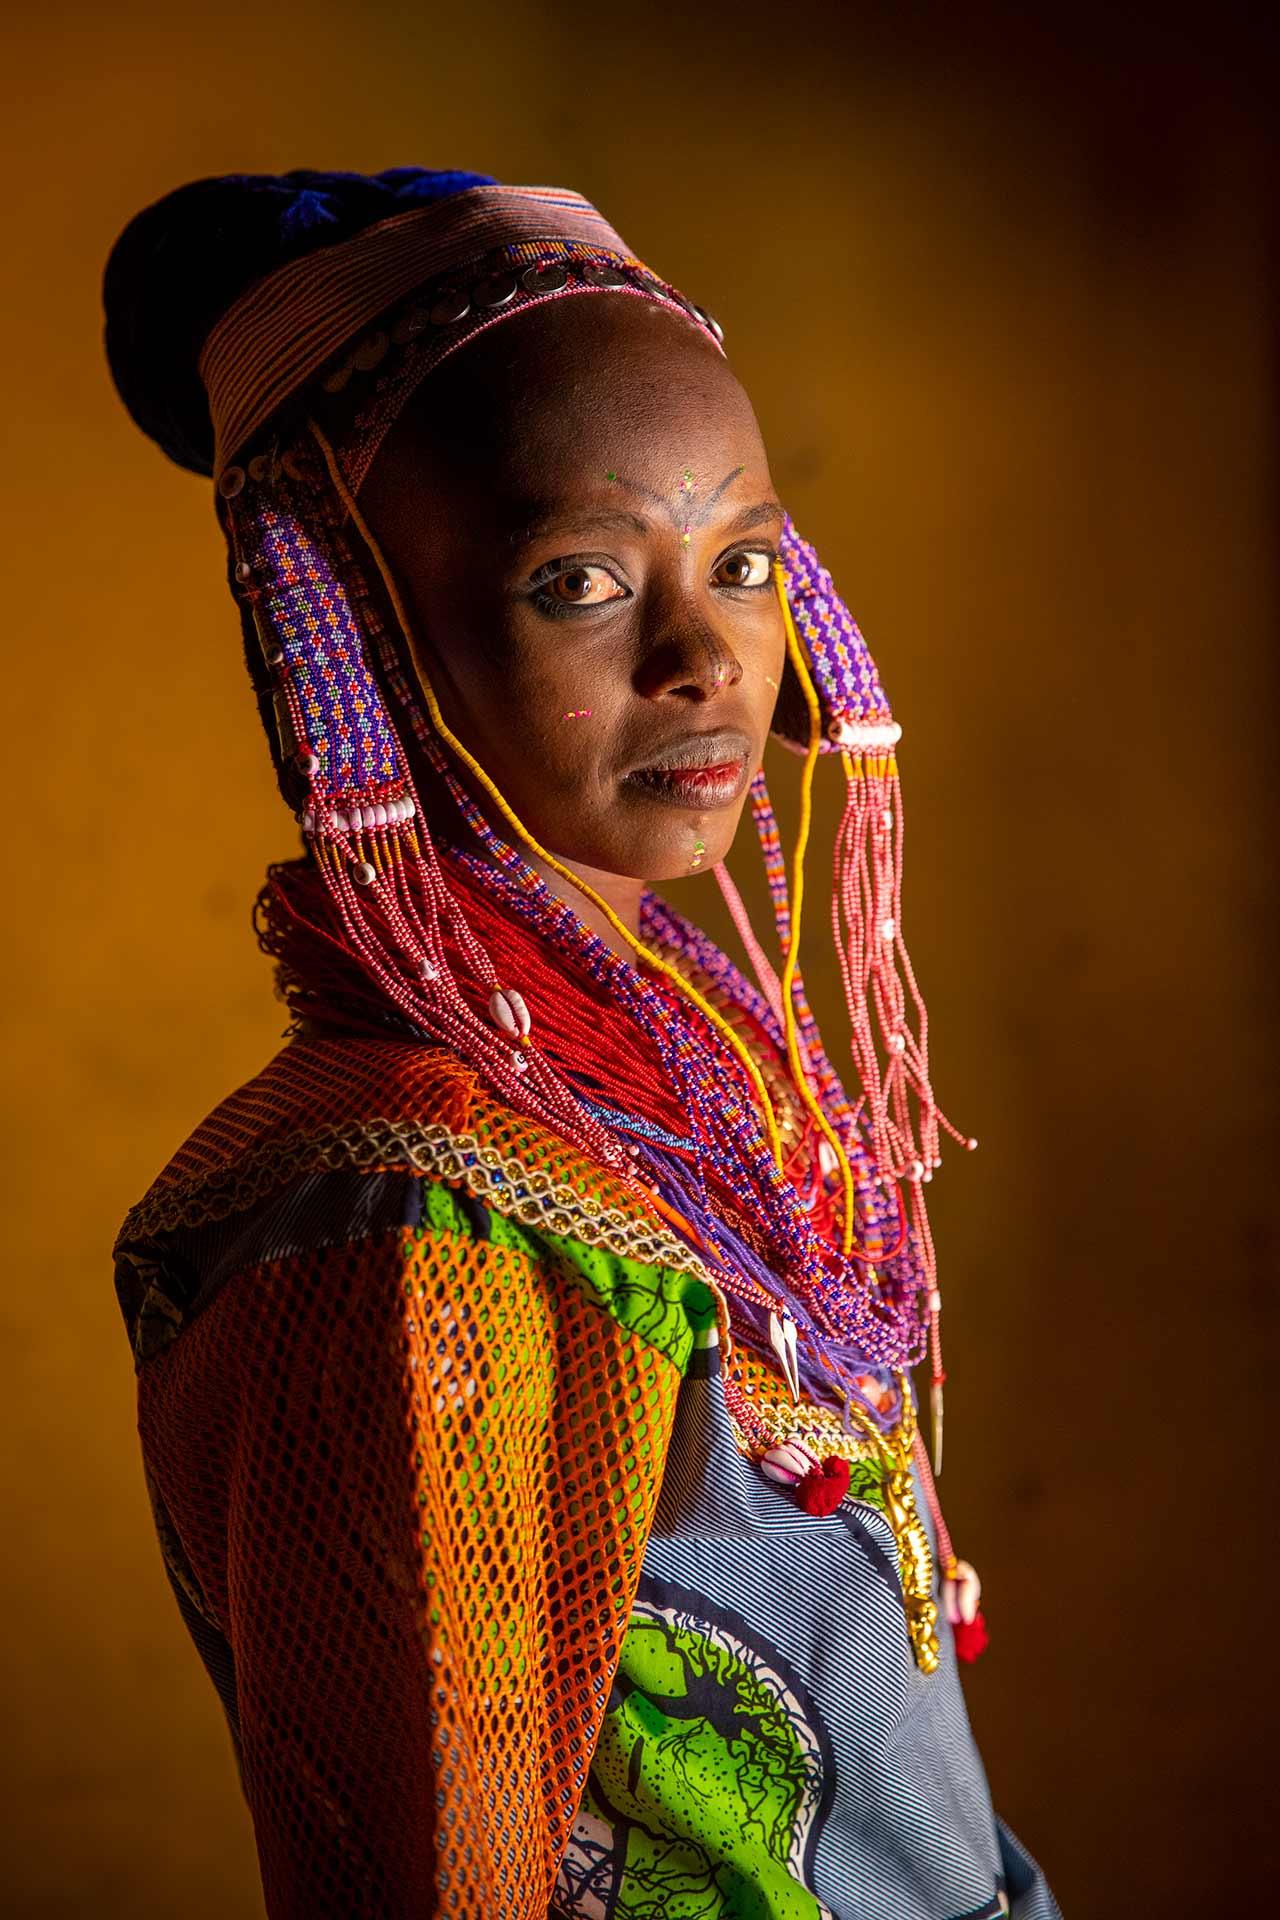 fulani-benin-viaje-fotografias